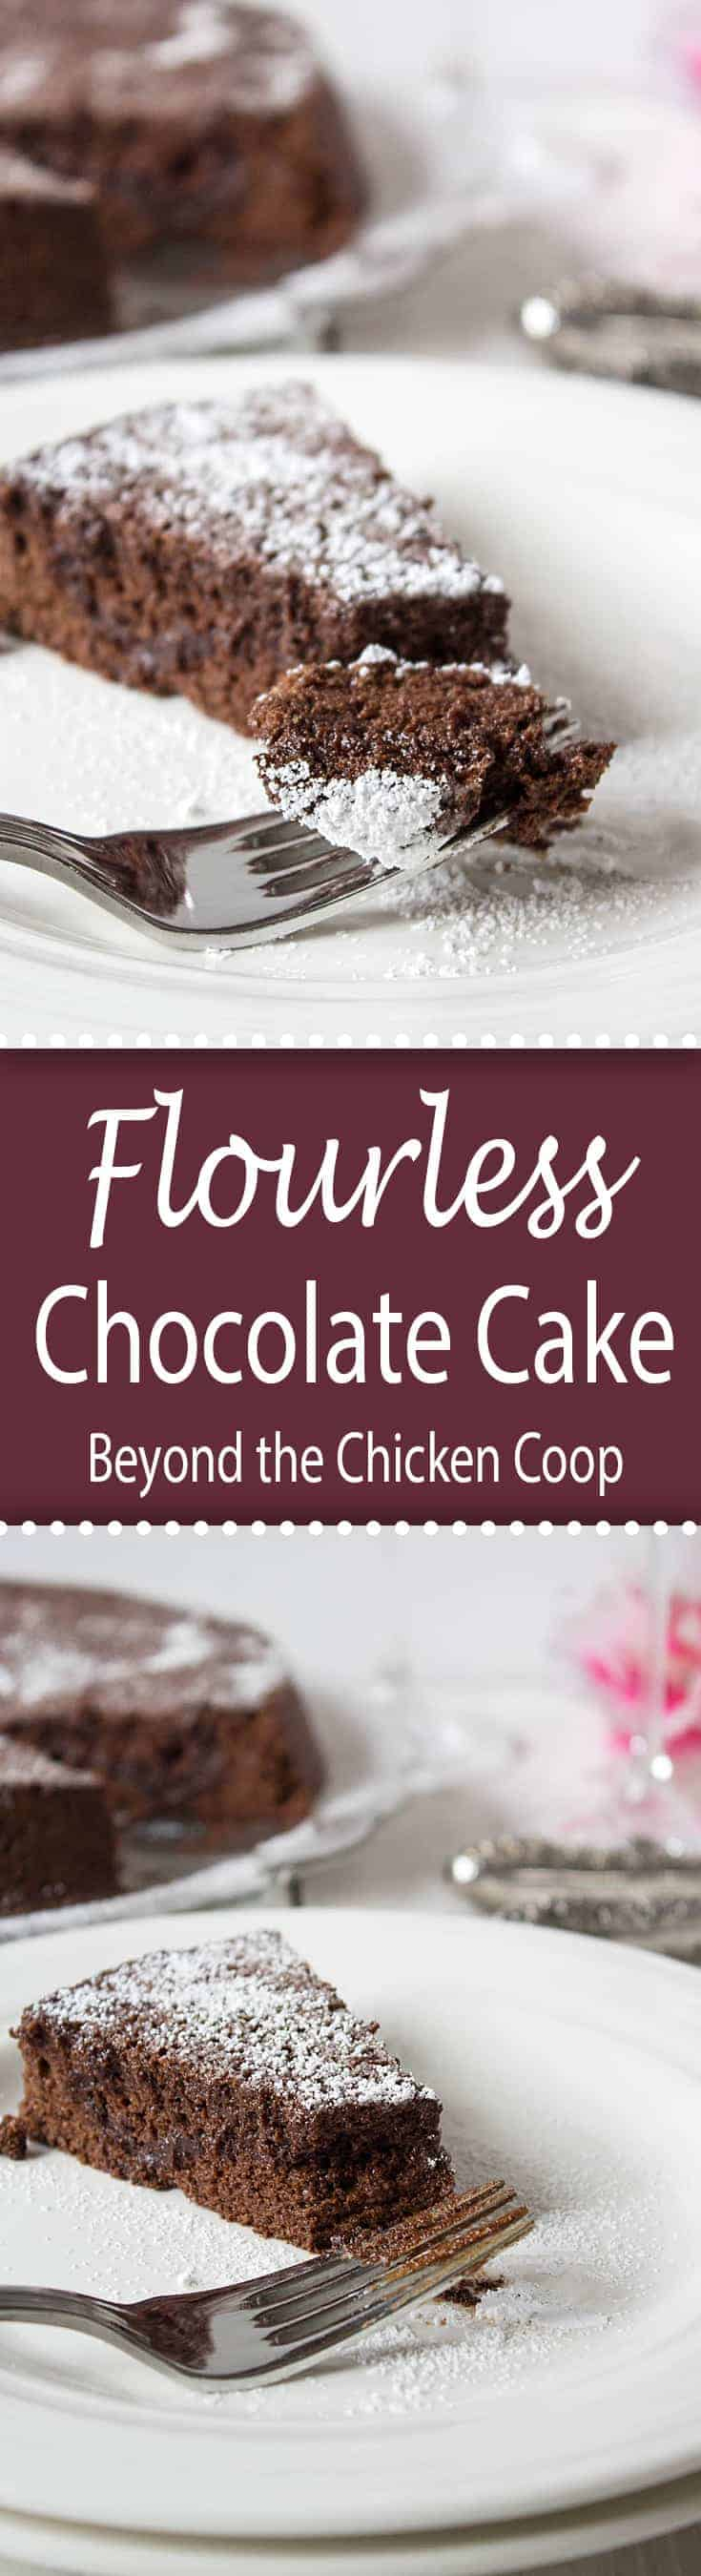 Flourless chocolate cake is rich and so chocolaty. #chocolate #flourlesscake #baking #glutenfree